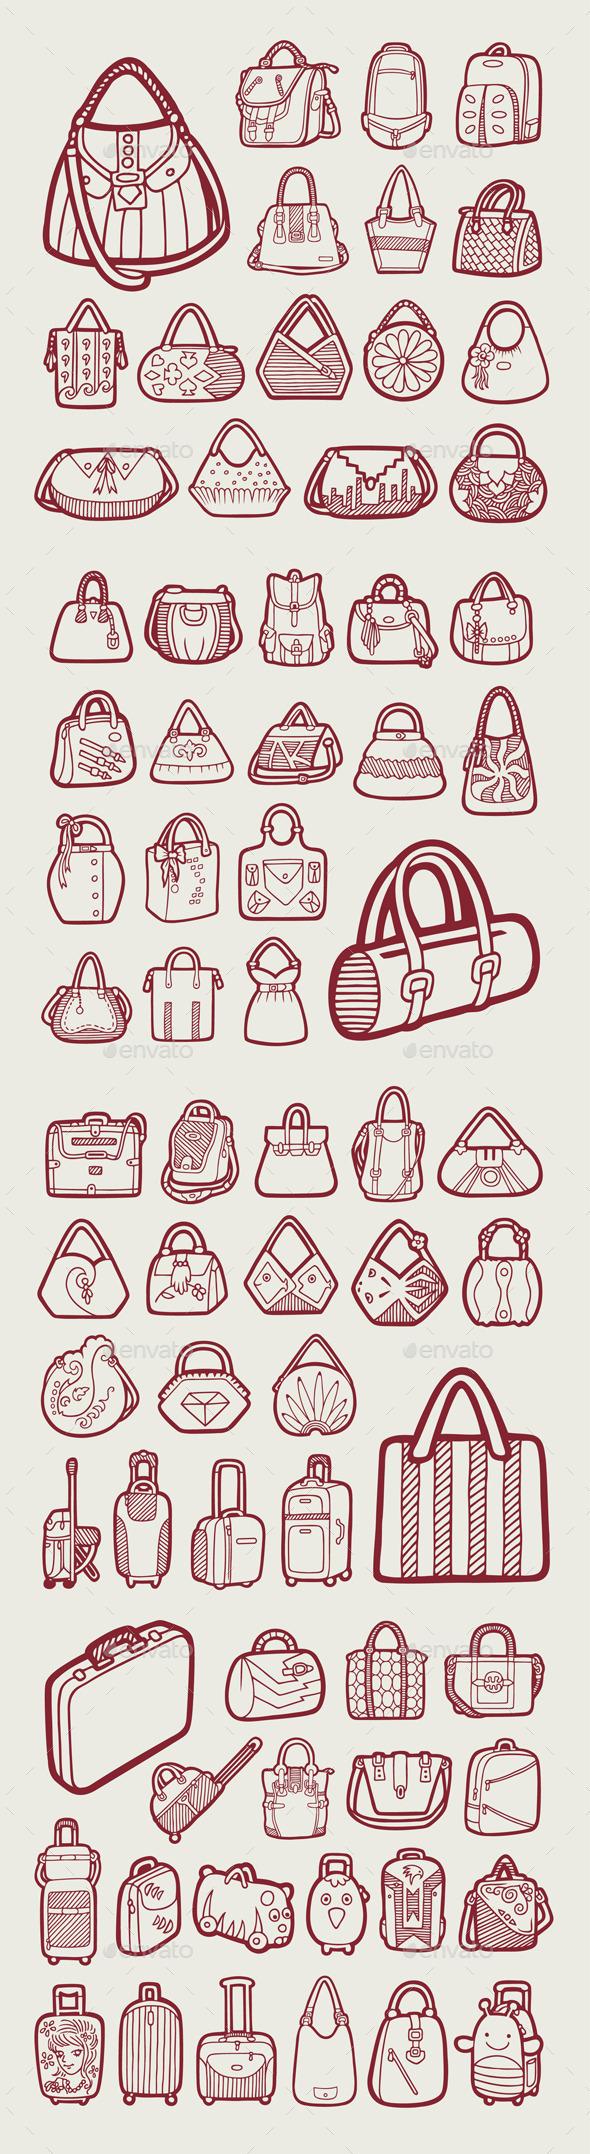 GraphicRiver 71 Bag Icons 11009021